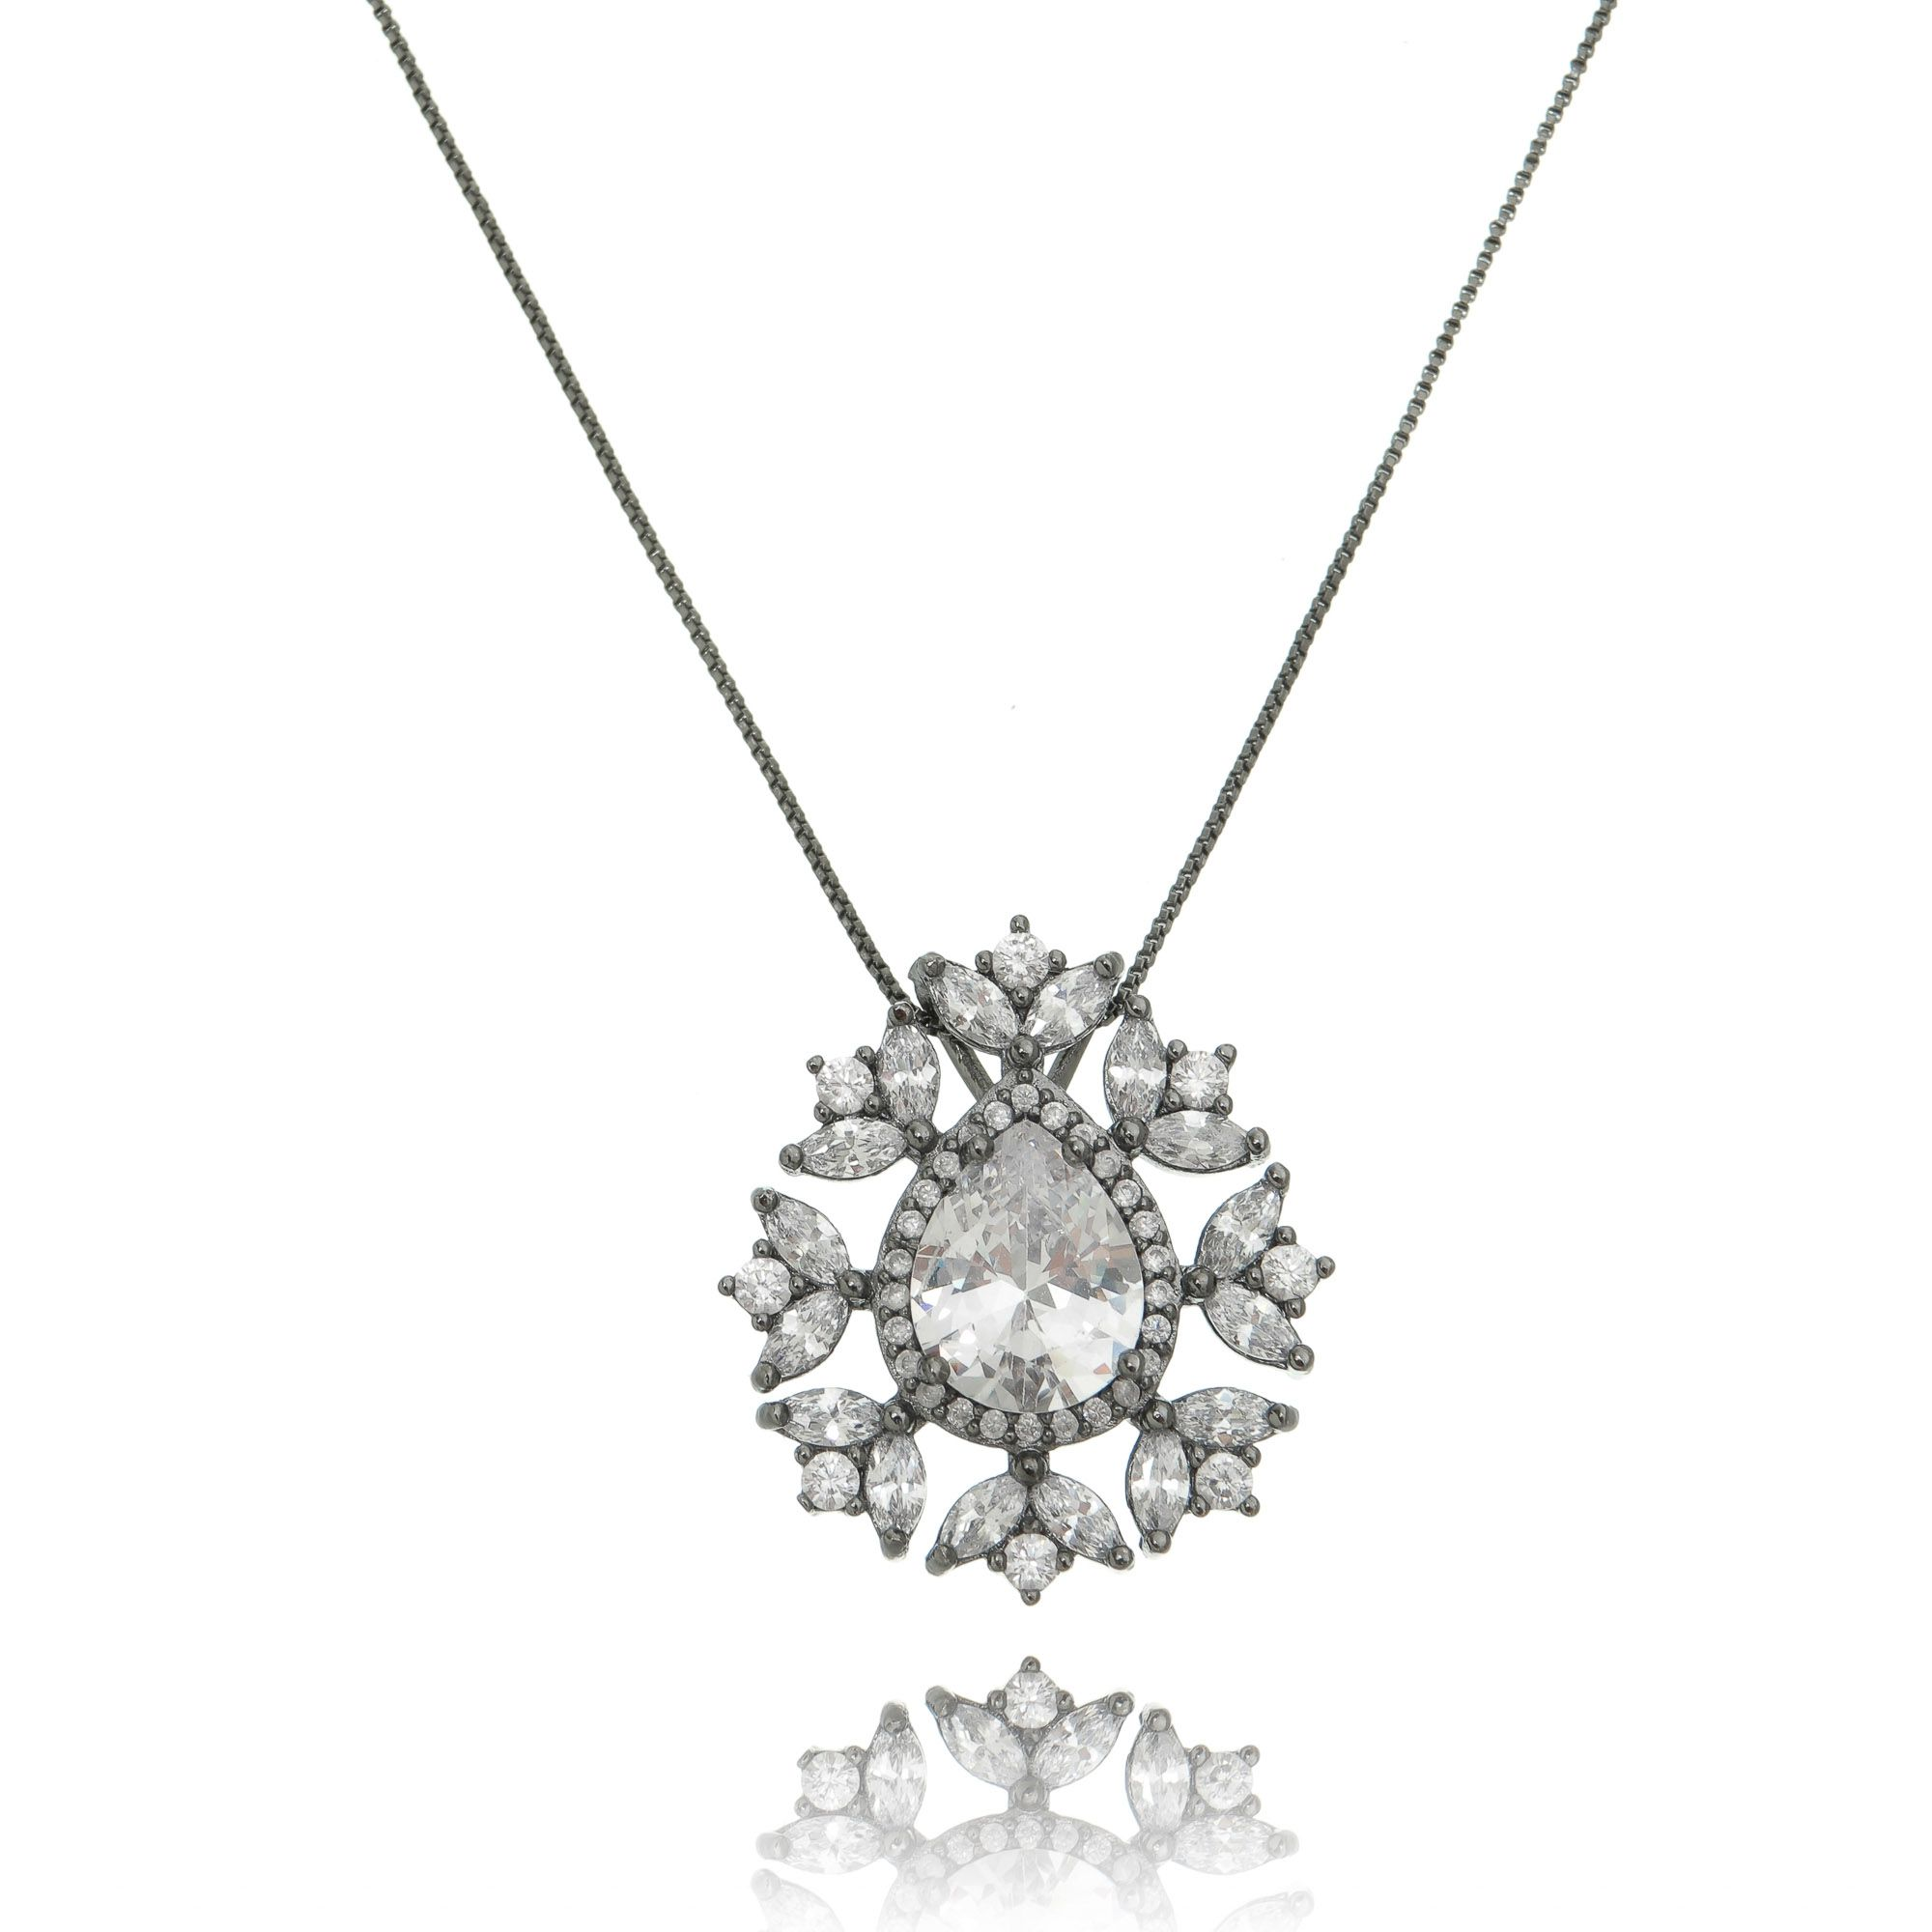 Colar de Gota Zircônia Cristal Semijoia Luxuosa em Ródio Negro  - Soloyou